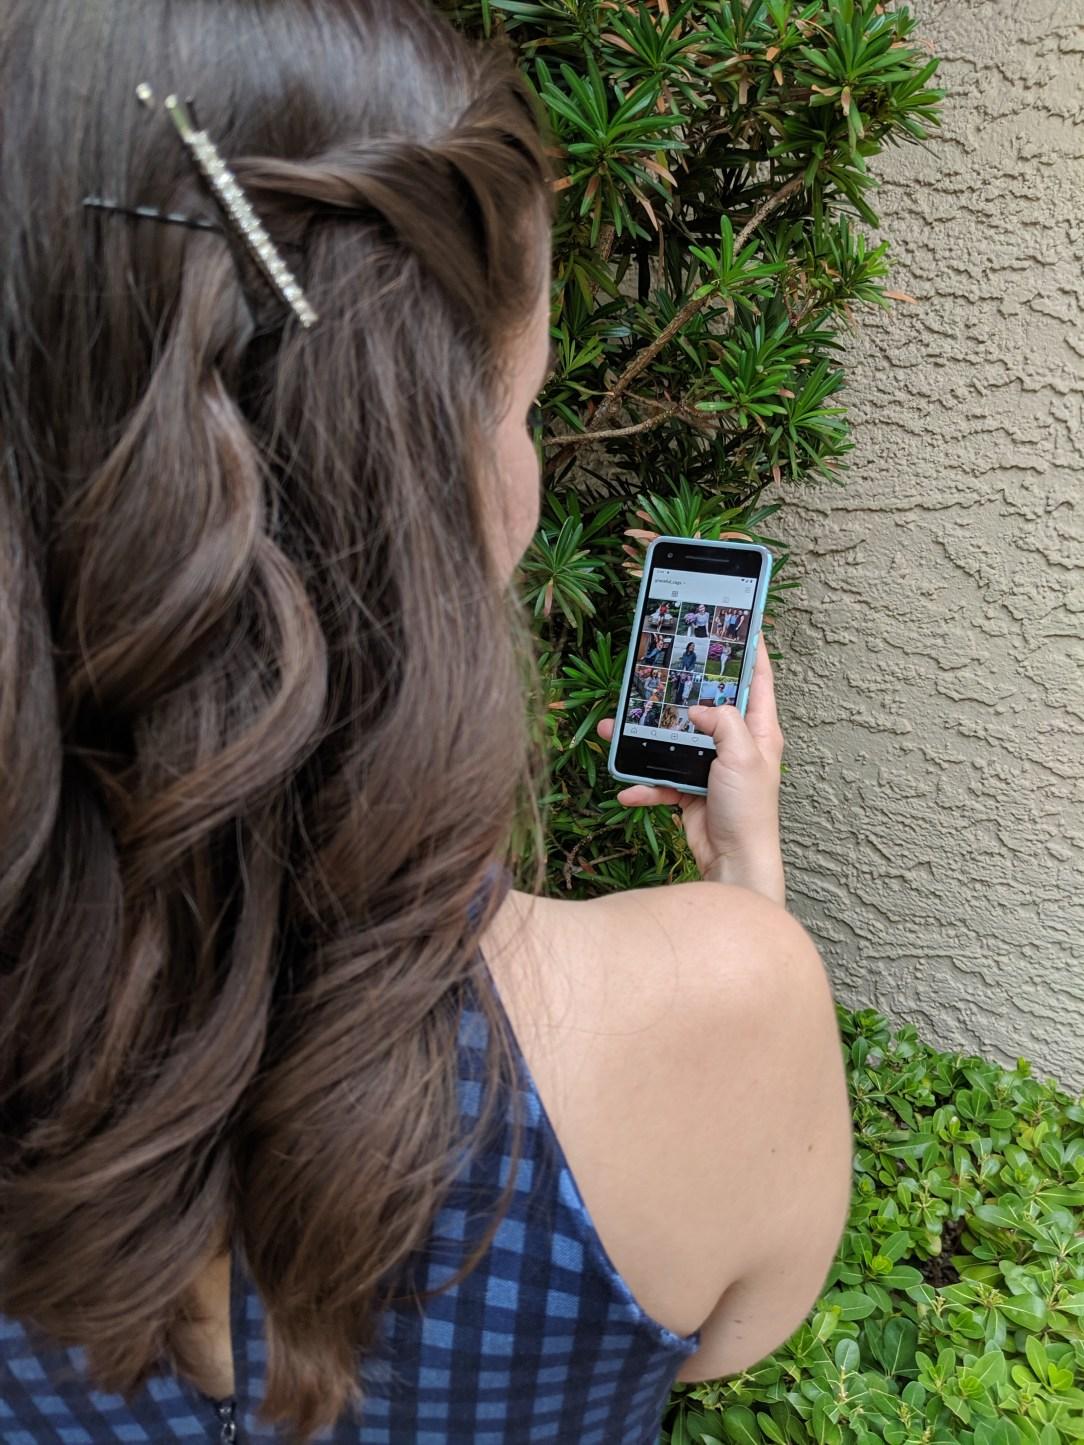 Scrolling Instagram, Instagram feed, social media